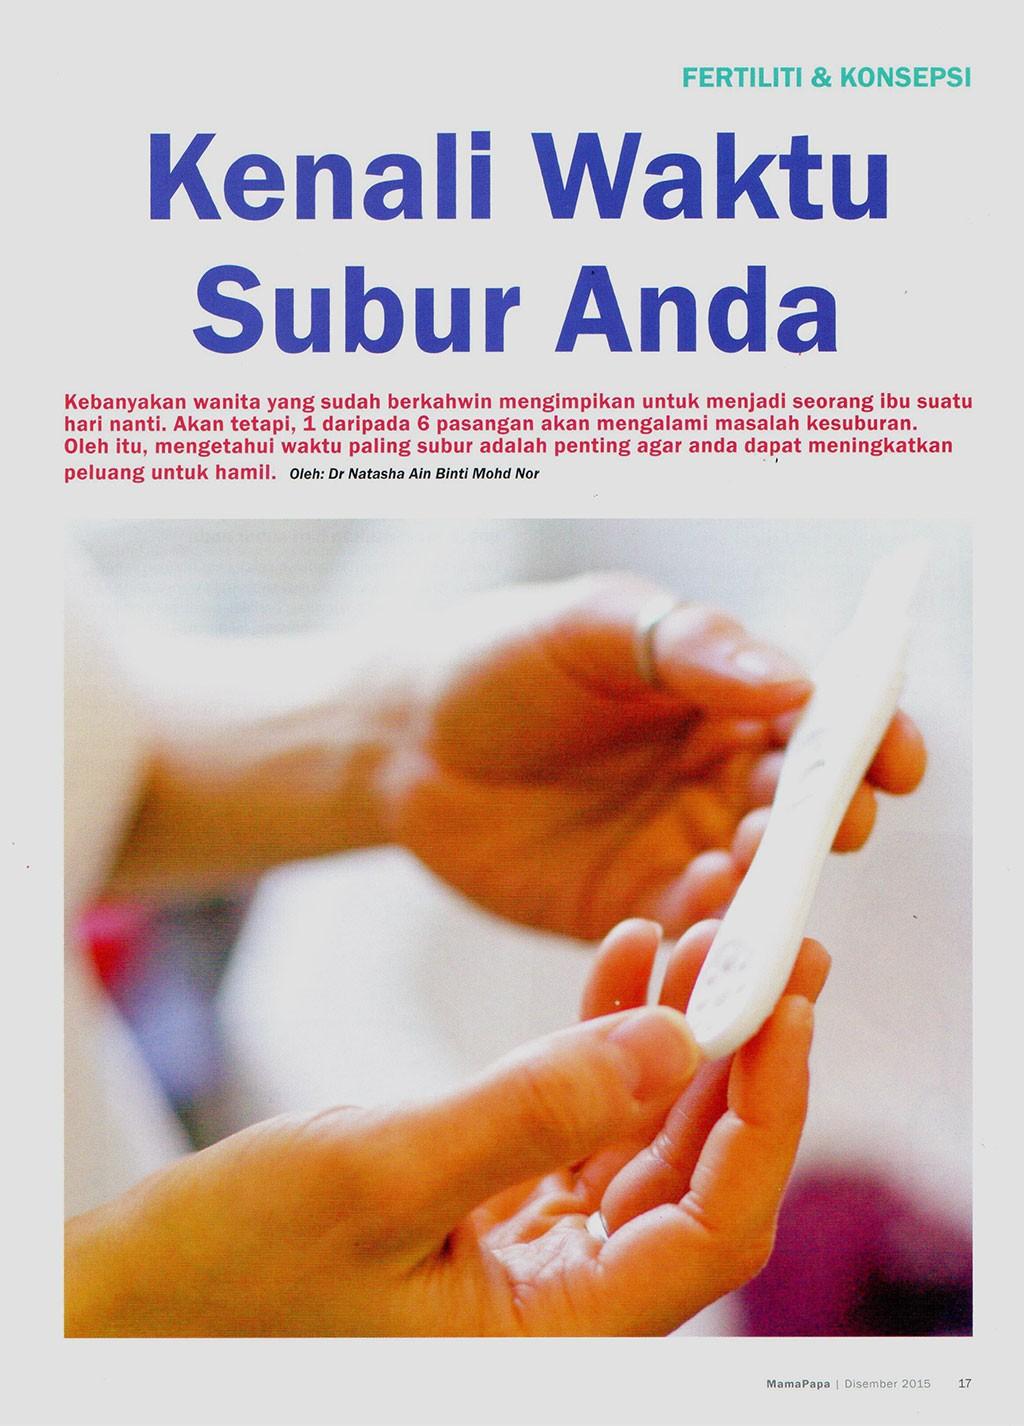 Kenali Waktu Subur Anda - MamaPapa (December 2015) page 17